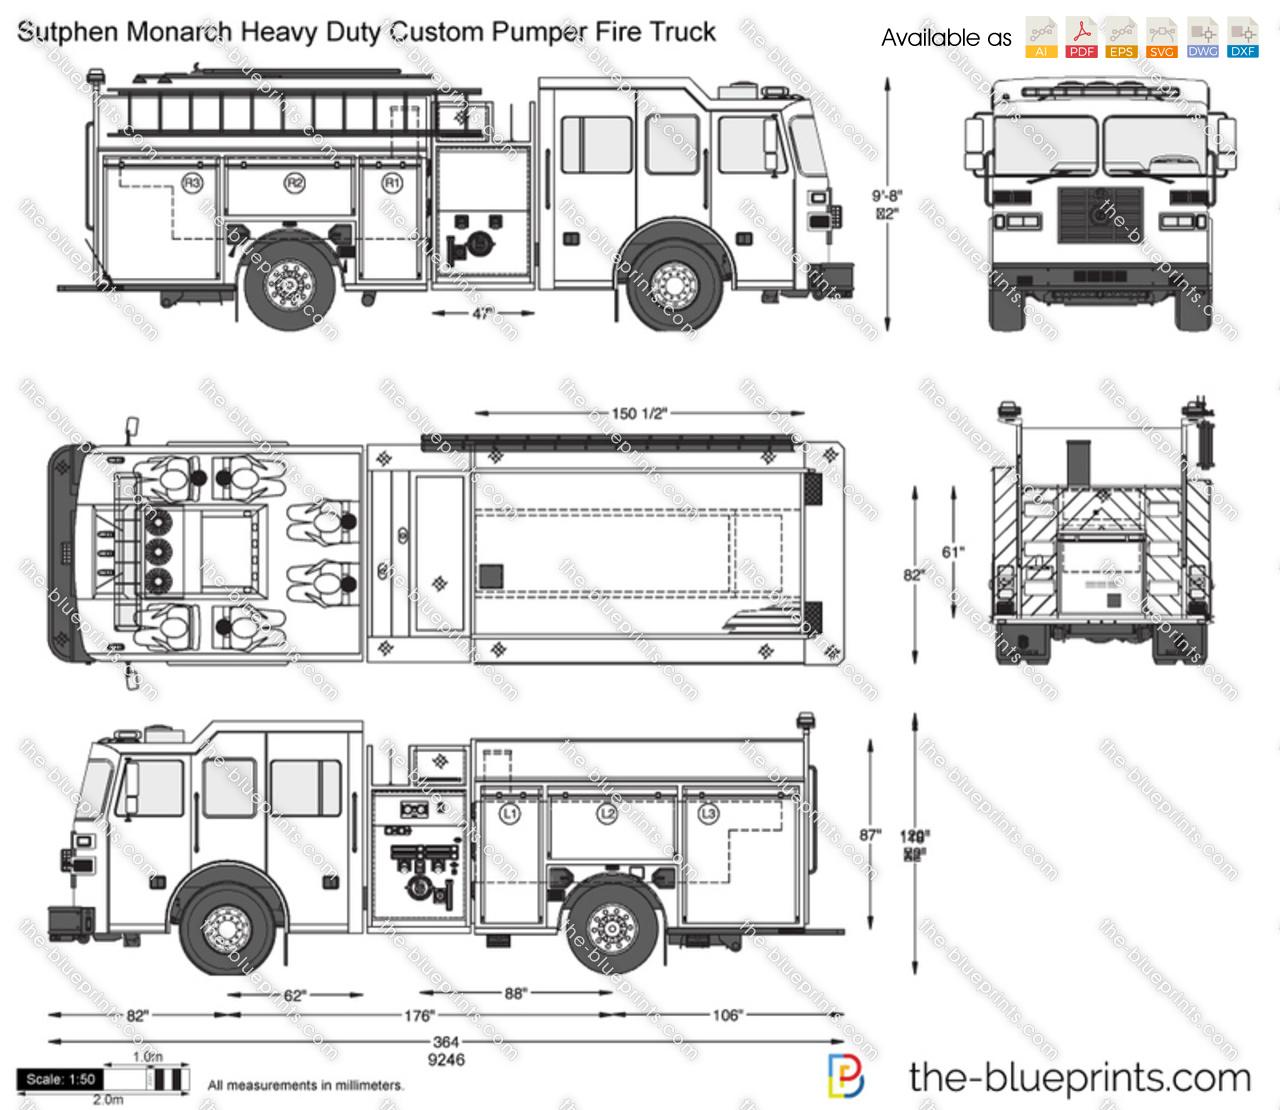 Pierce Fire Pump Diagram Engine